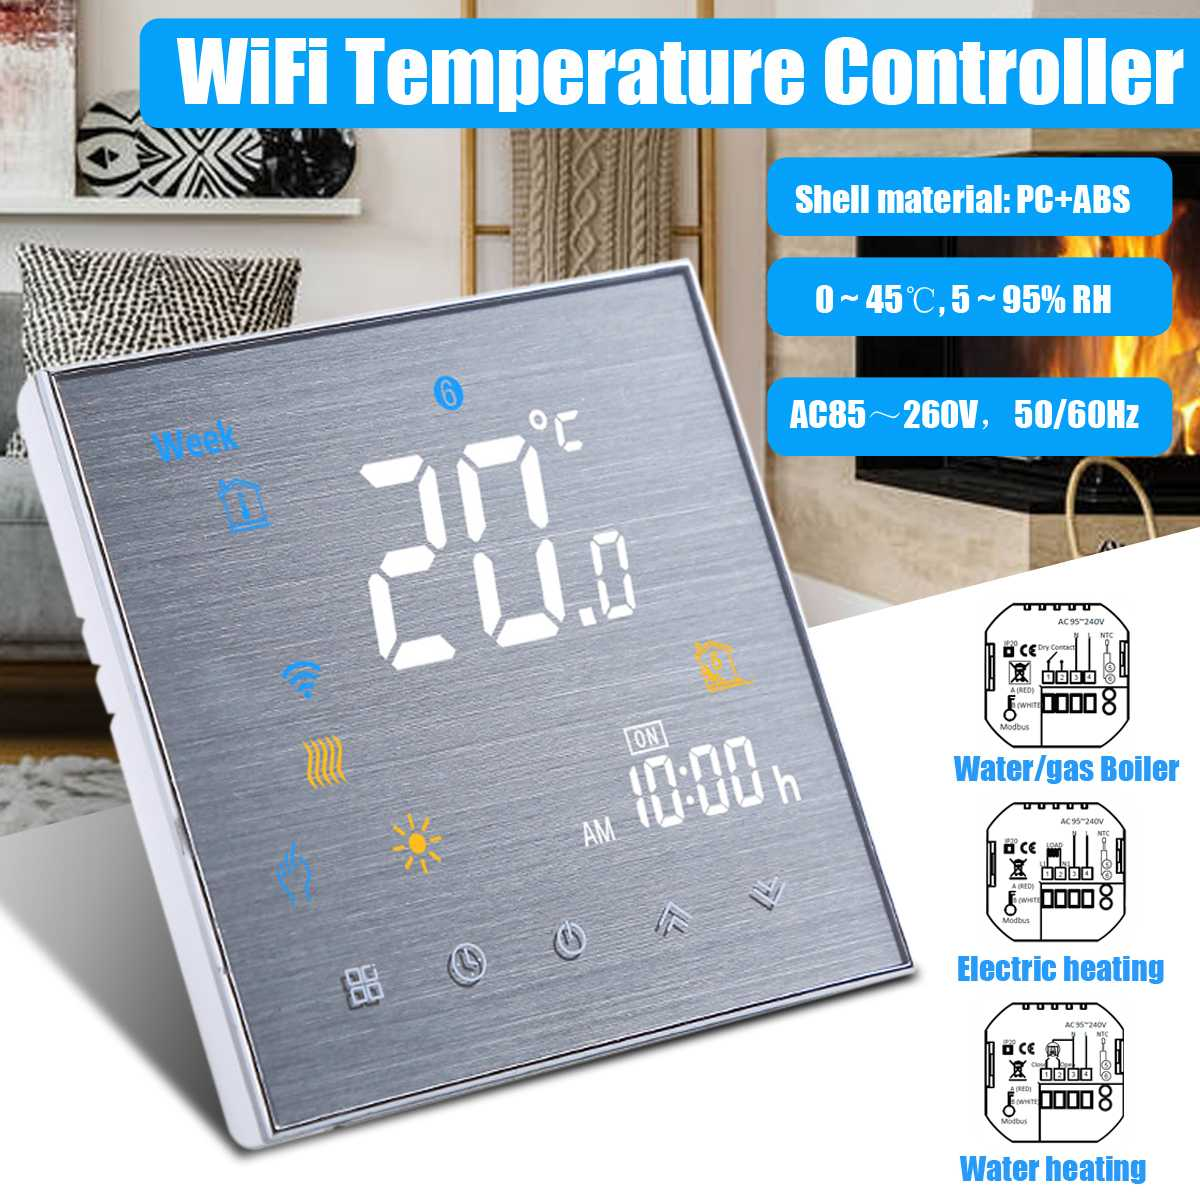 Termostato inteligente con WiFi, termostato para calefacción de agua, suelos, calentador de Gas, controlador de temperatura, Control de voz para Google Home